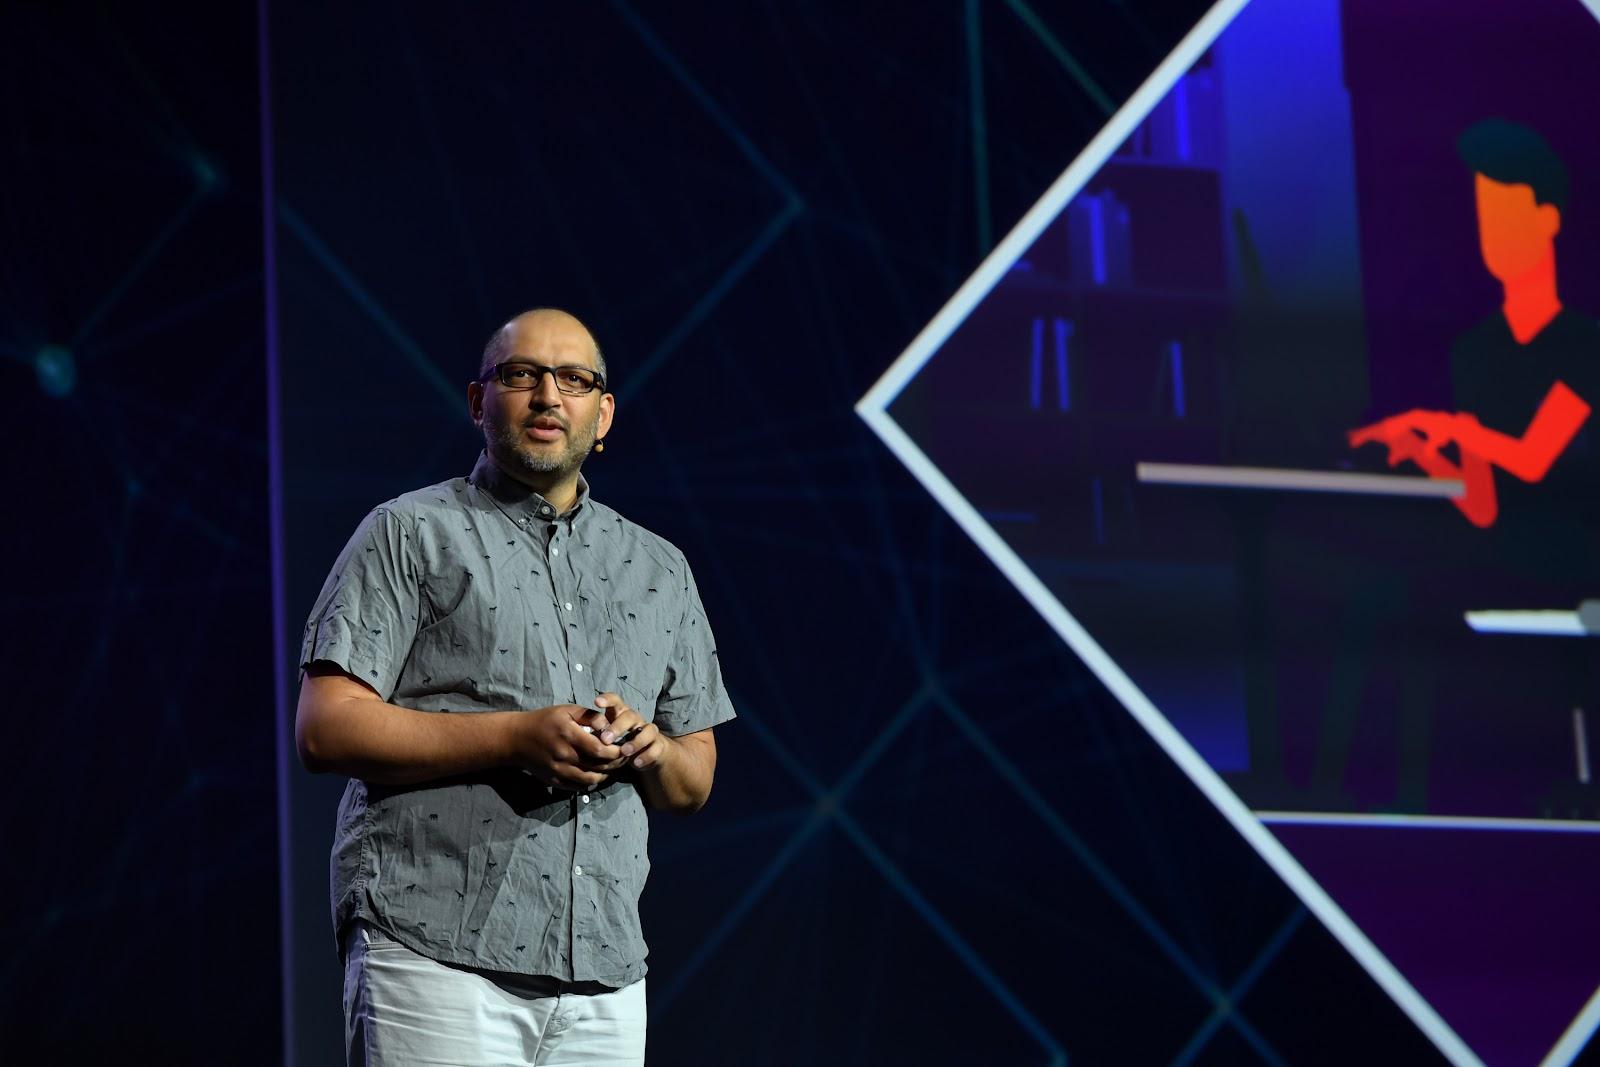 Shawn Ahmed DevOps World Jenkins World 2019 Software Delivery Management